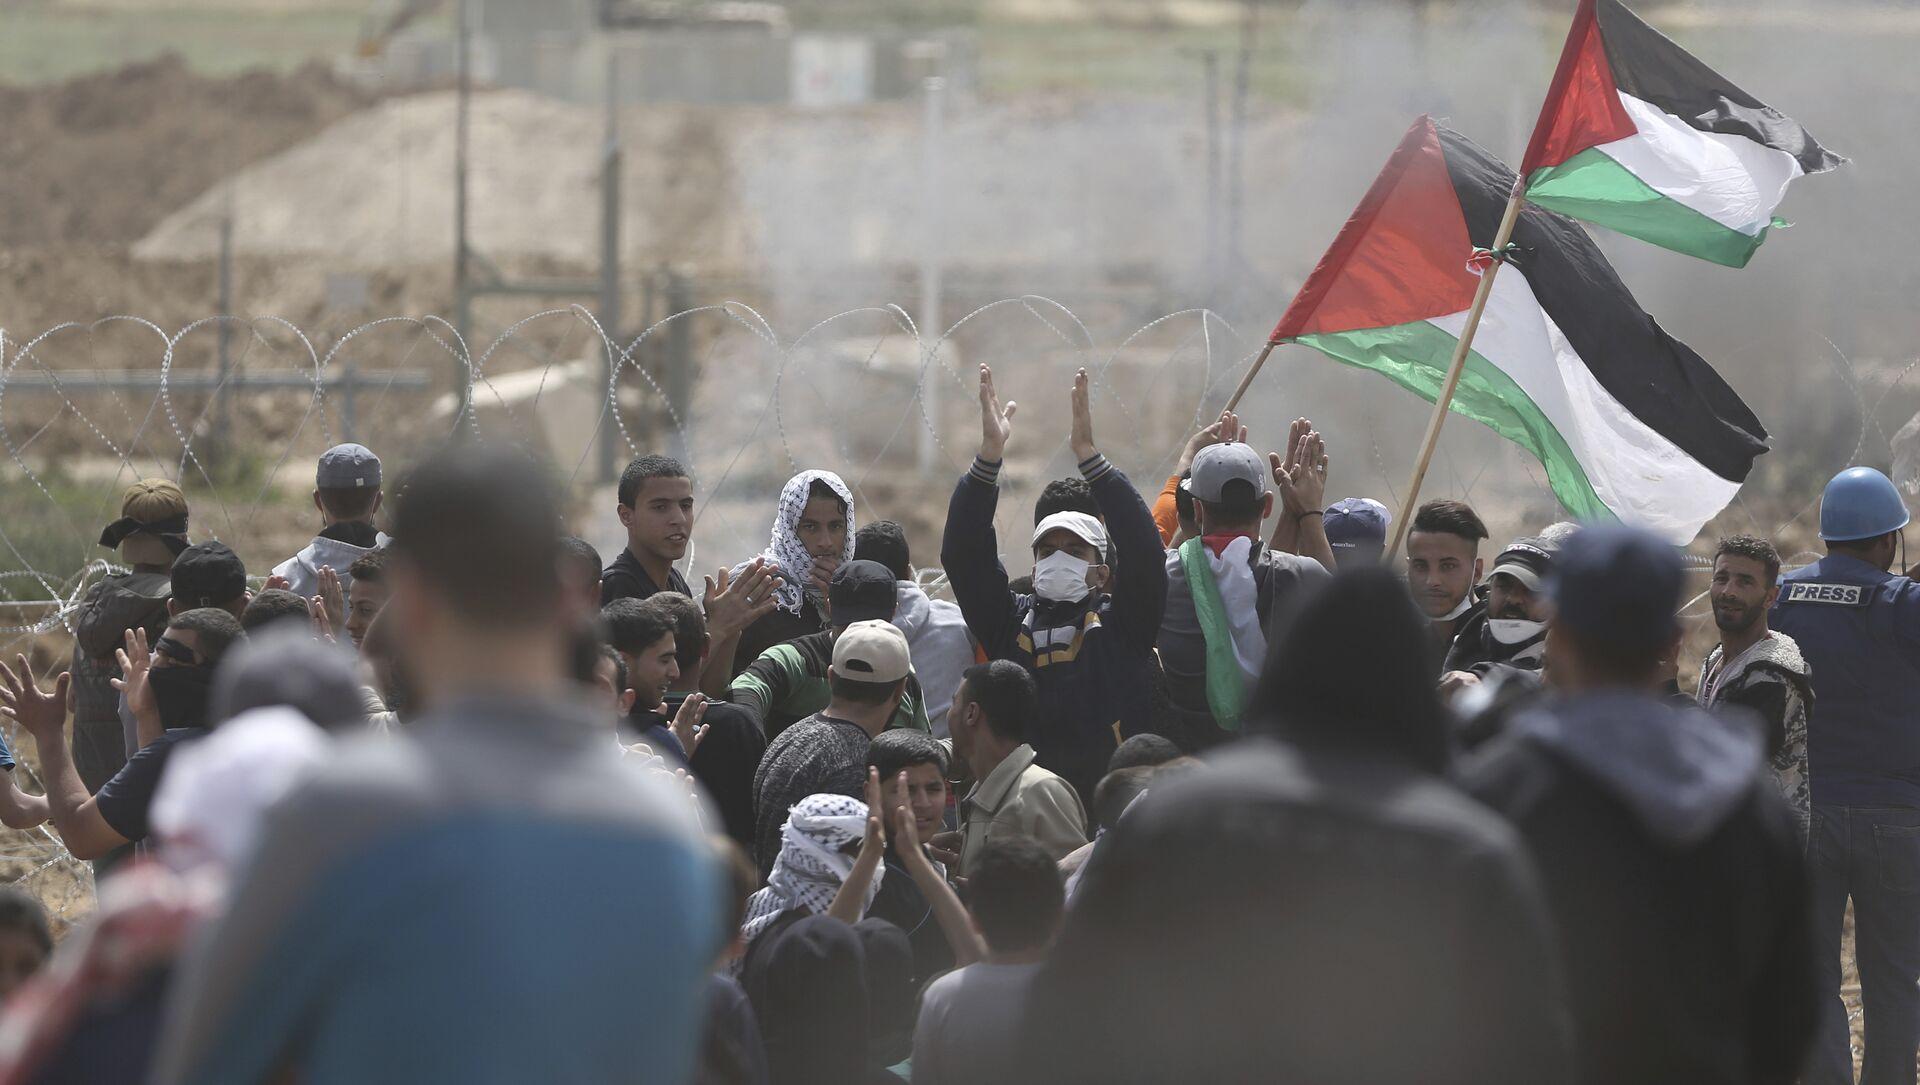 Proteste palestinesi - Sputnik Italia, 1920, 15.05.2021